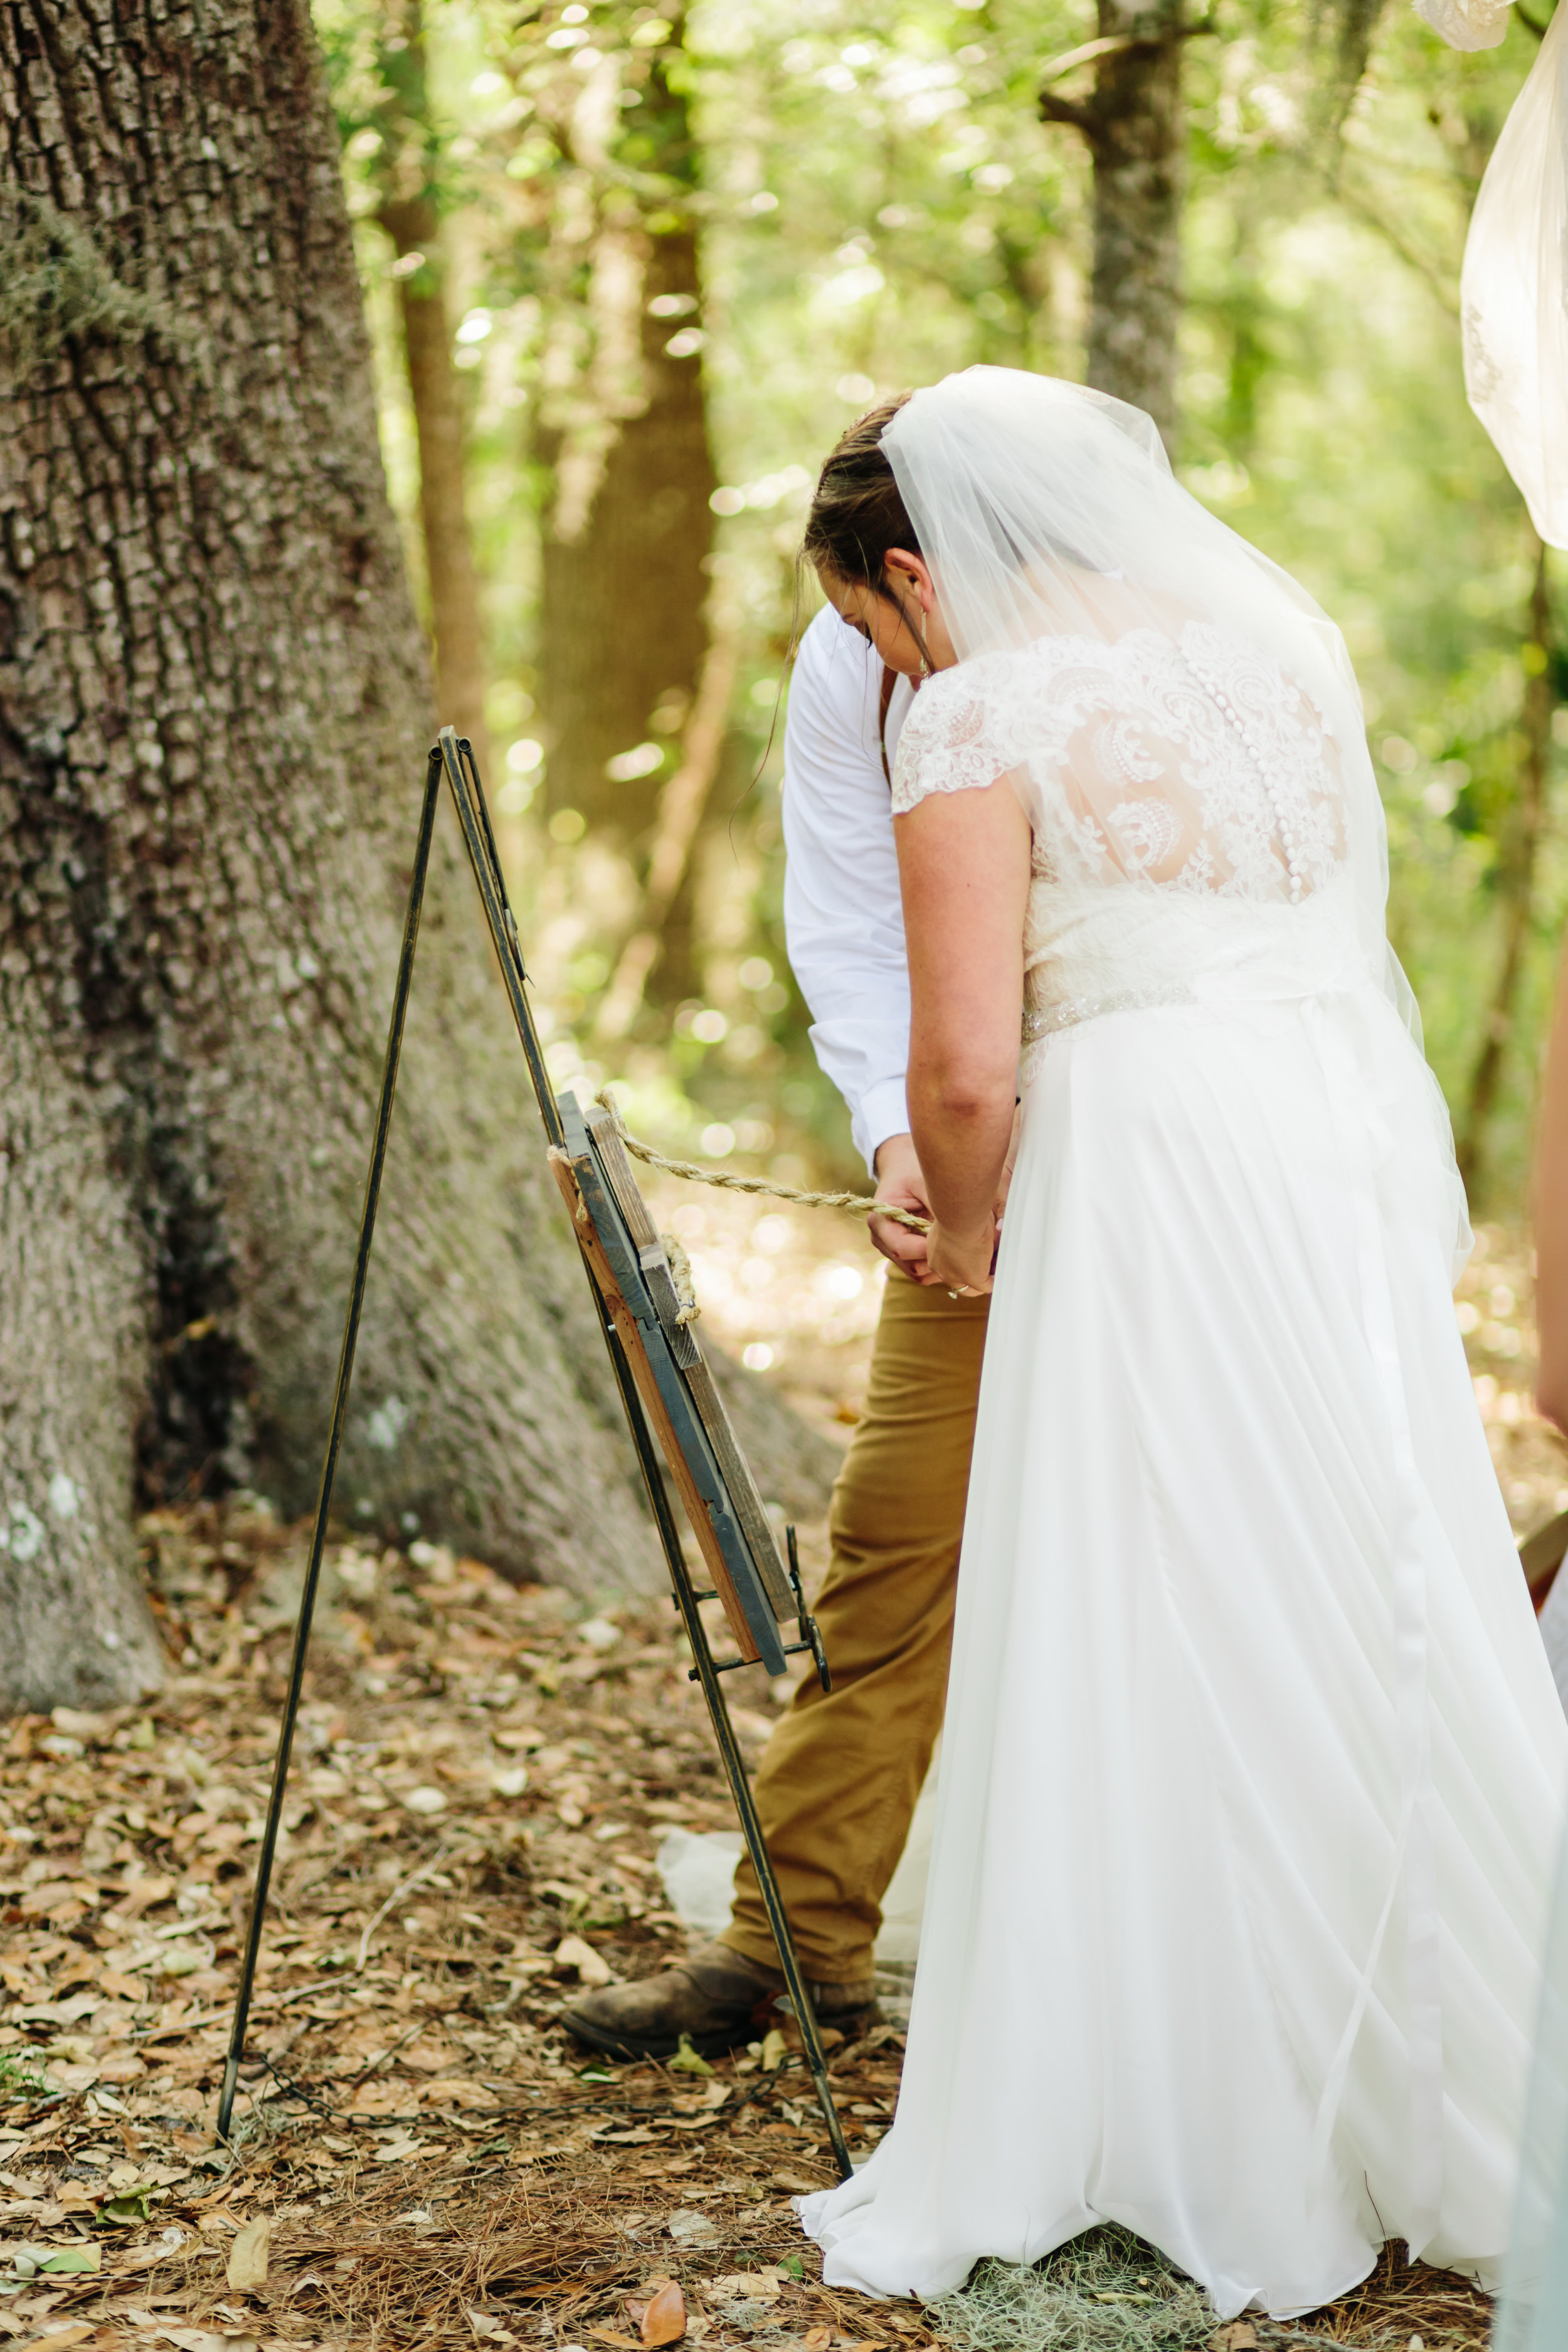 Griffin Wedding October Oaks Farm-348.jpg